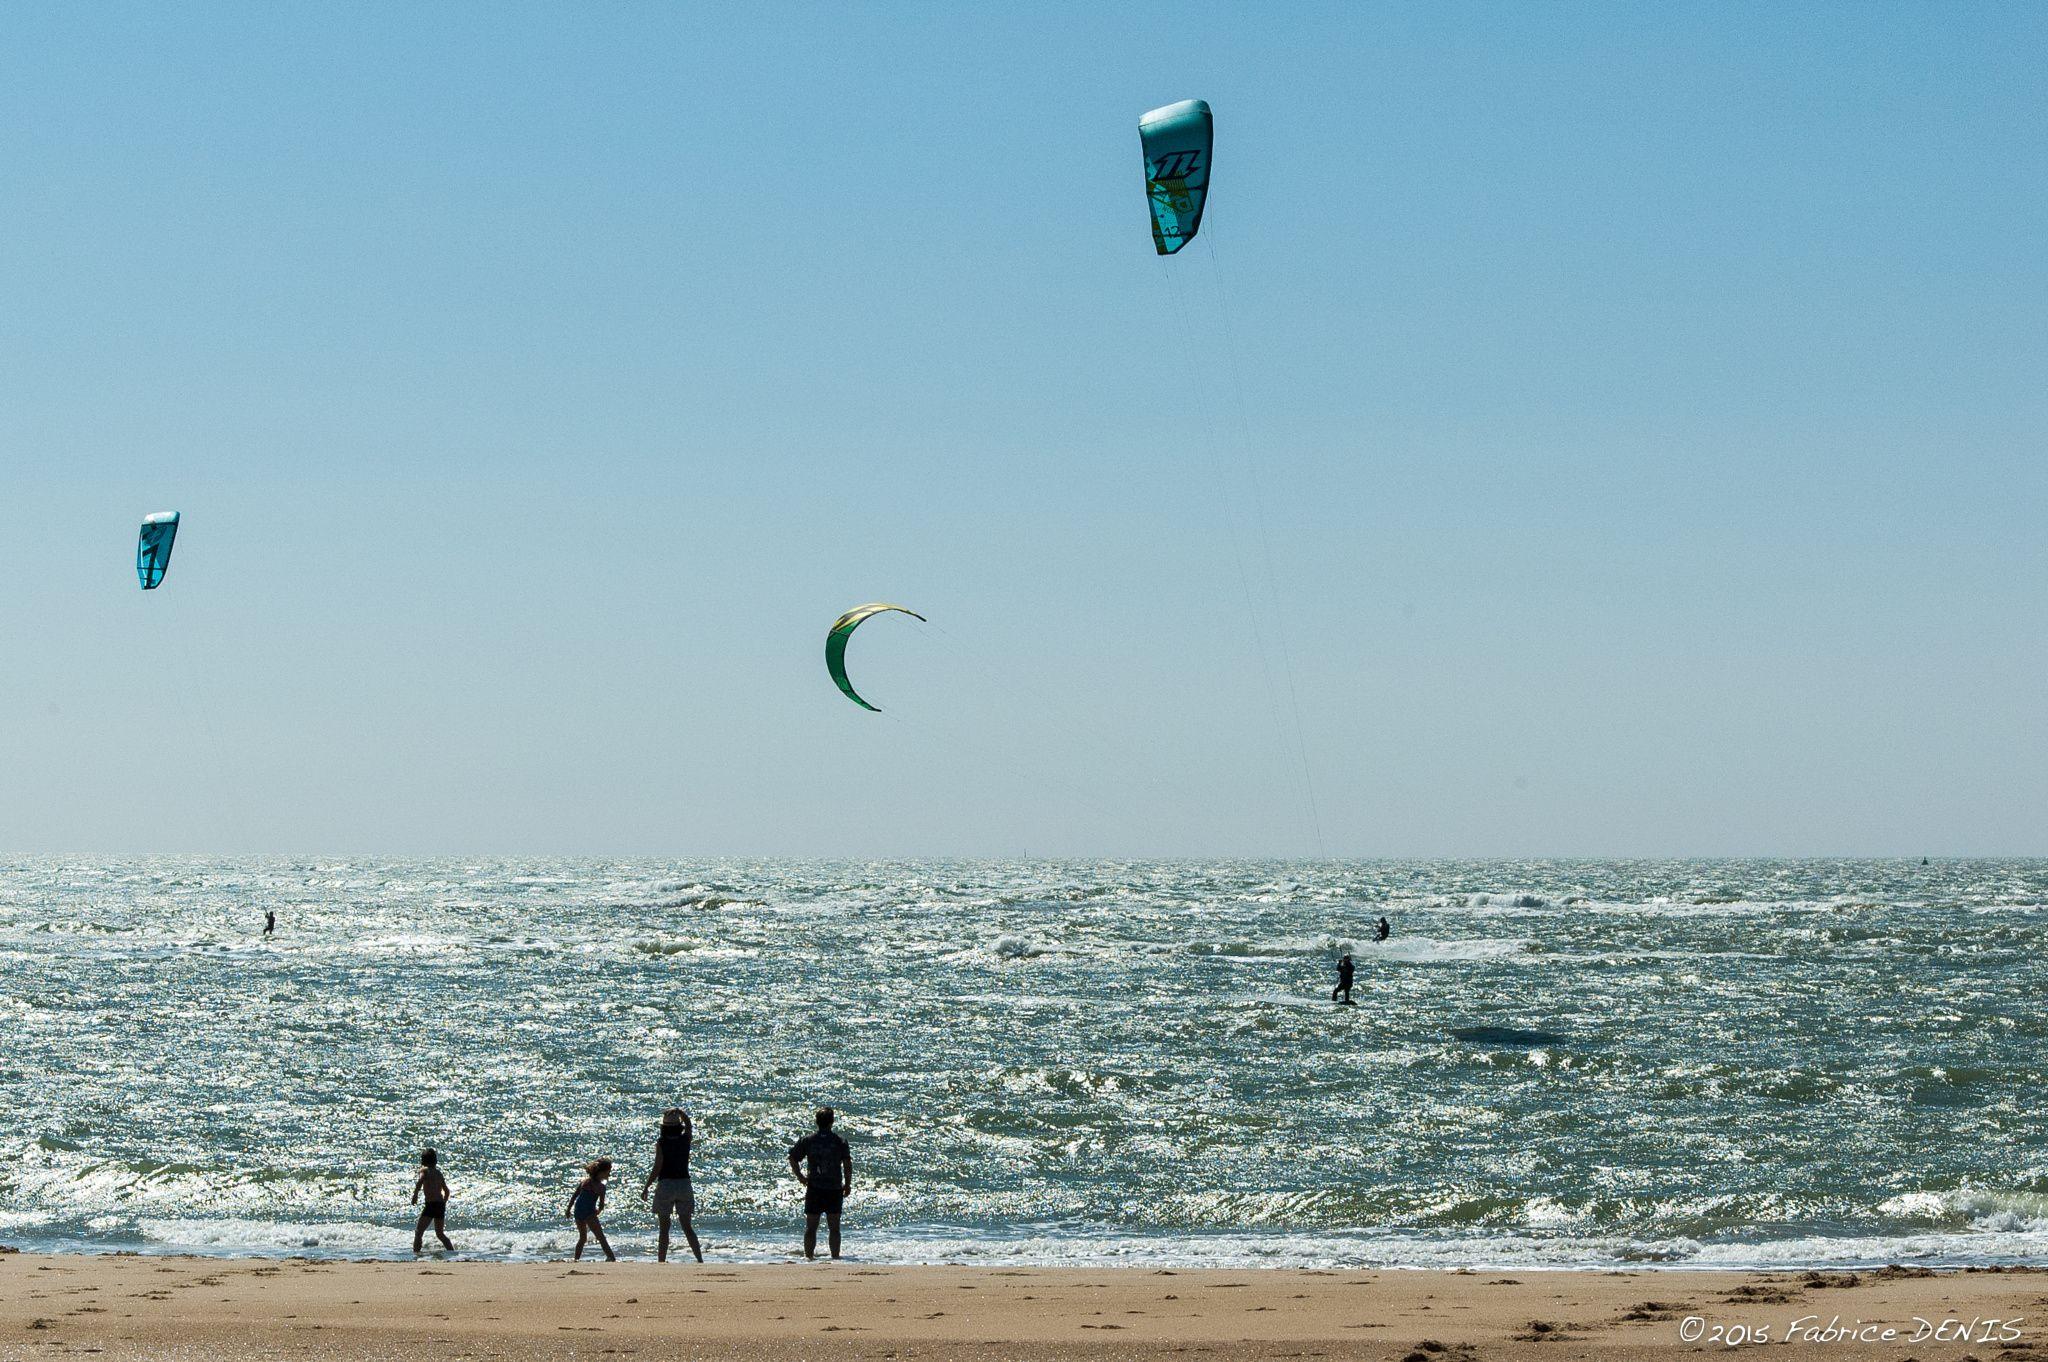 Kitesurf by Fabrice DENIS on 500px Côte Sauvage - Plage de la Pointe Espagnole